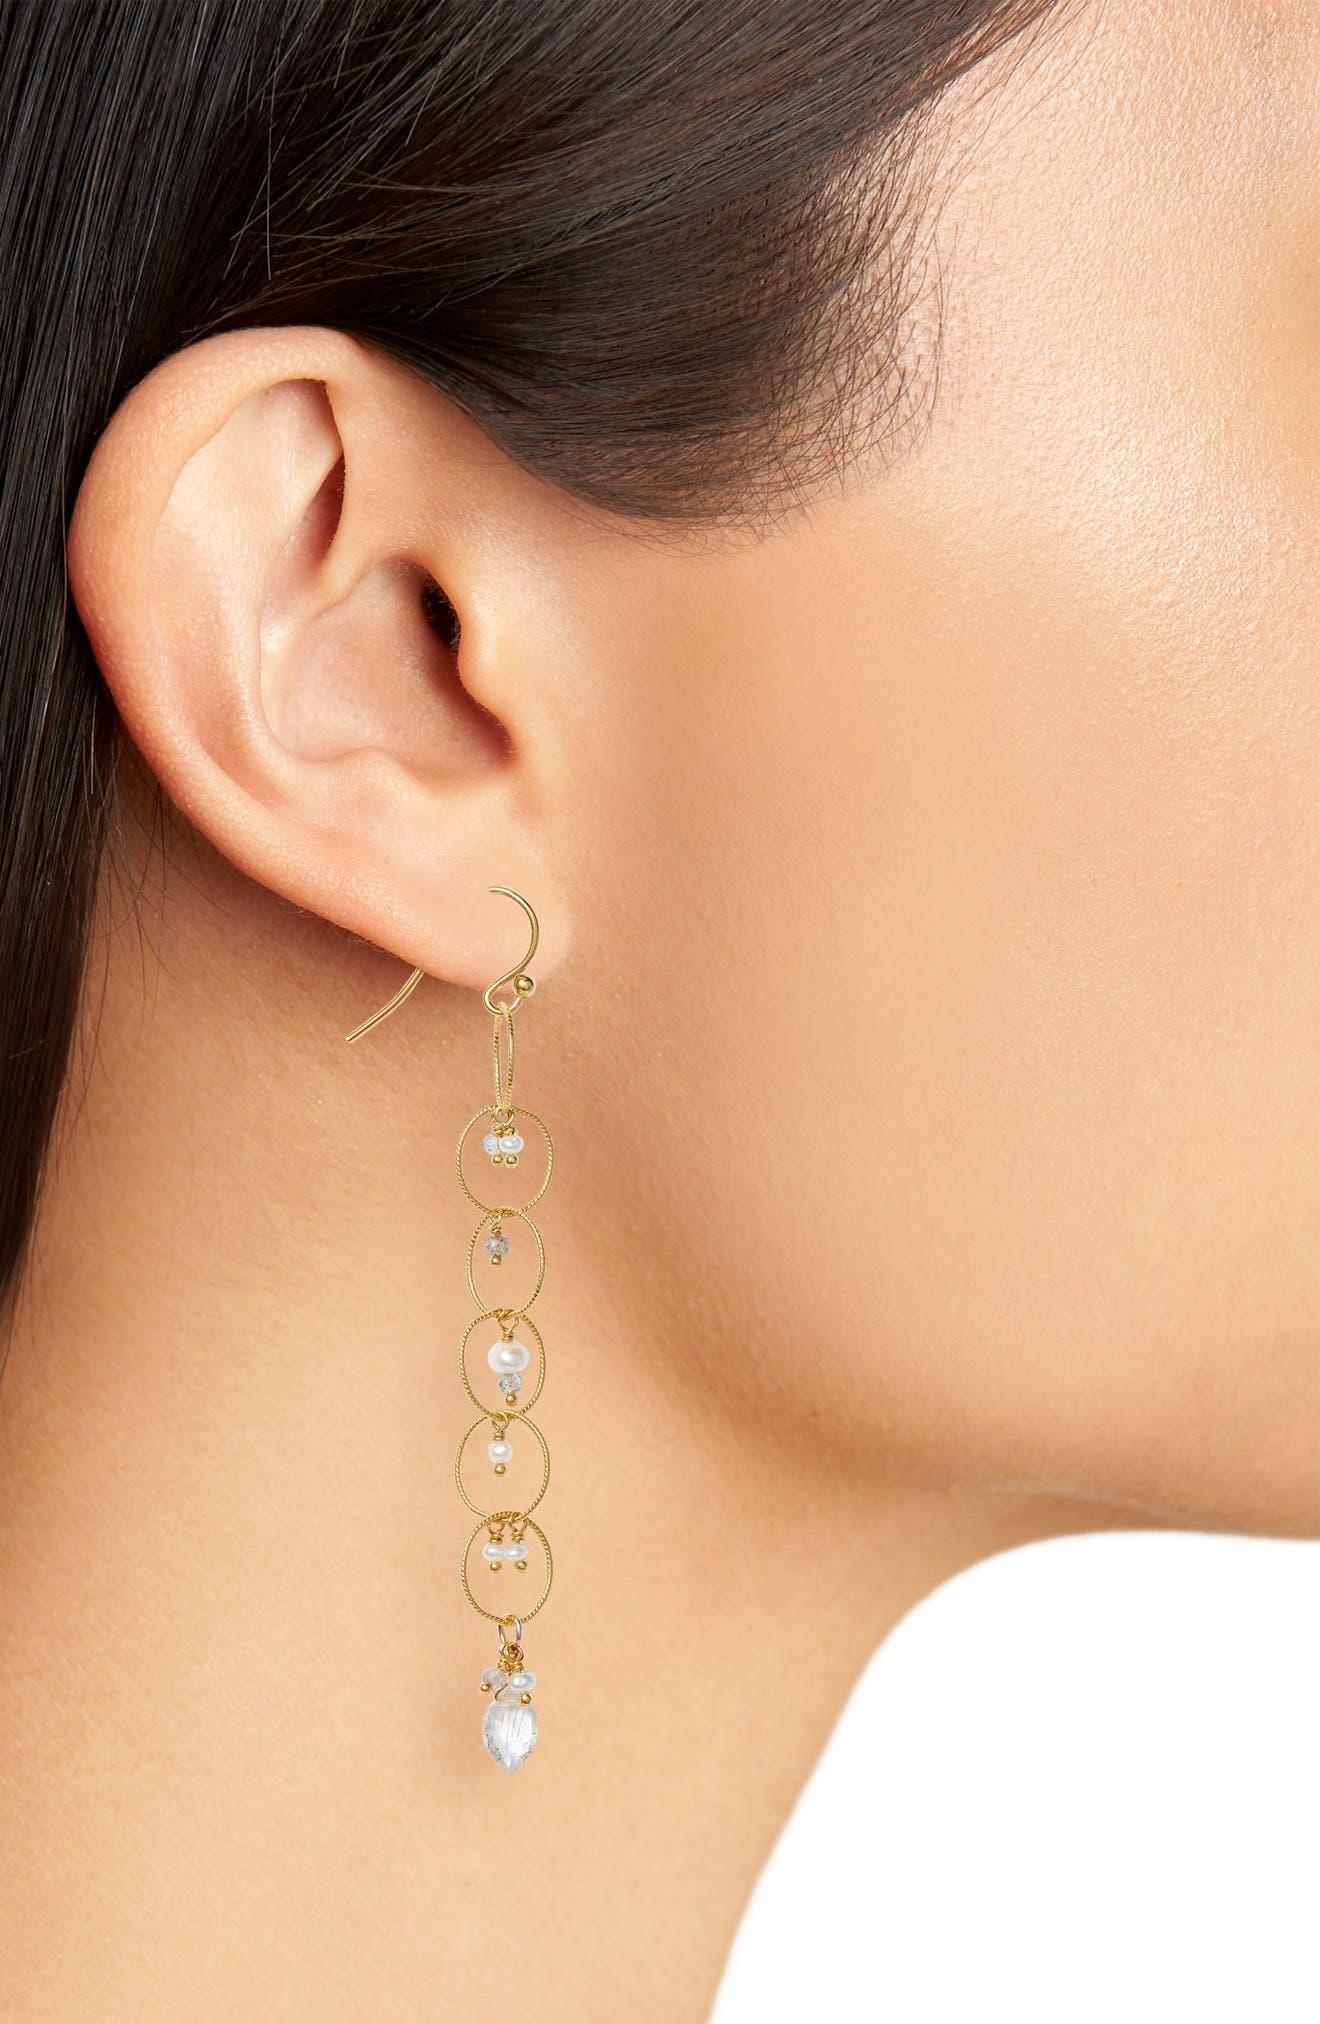 Chain Hoop Drop Earrings with Pearls,                             Alternate thumbnail 2, color,                             100